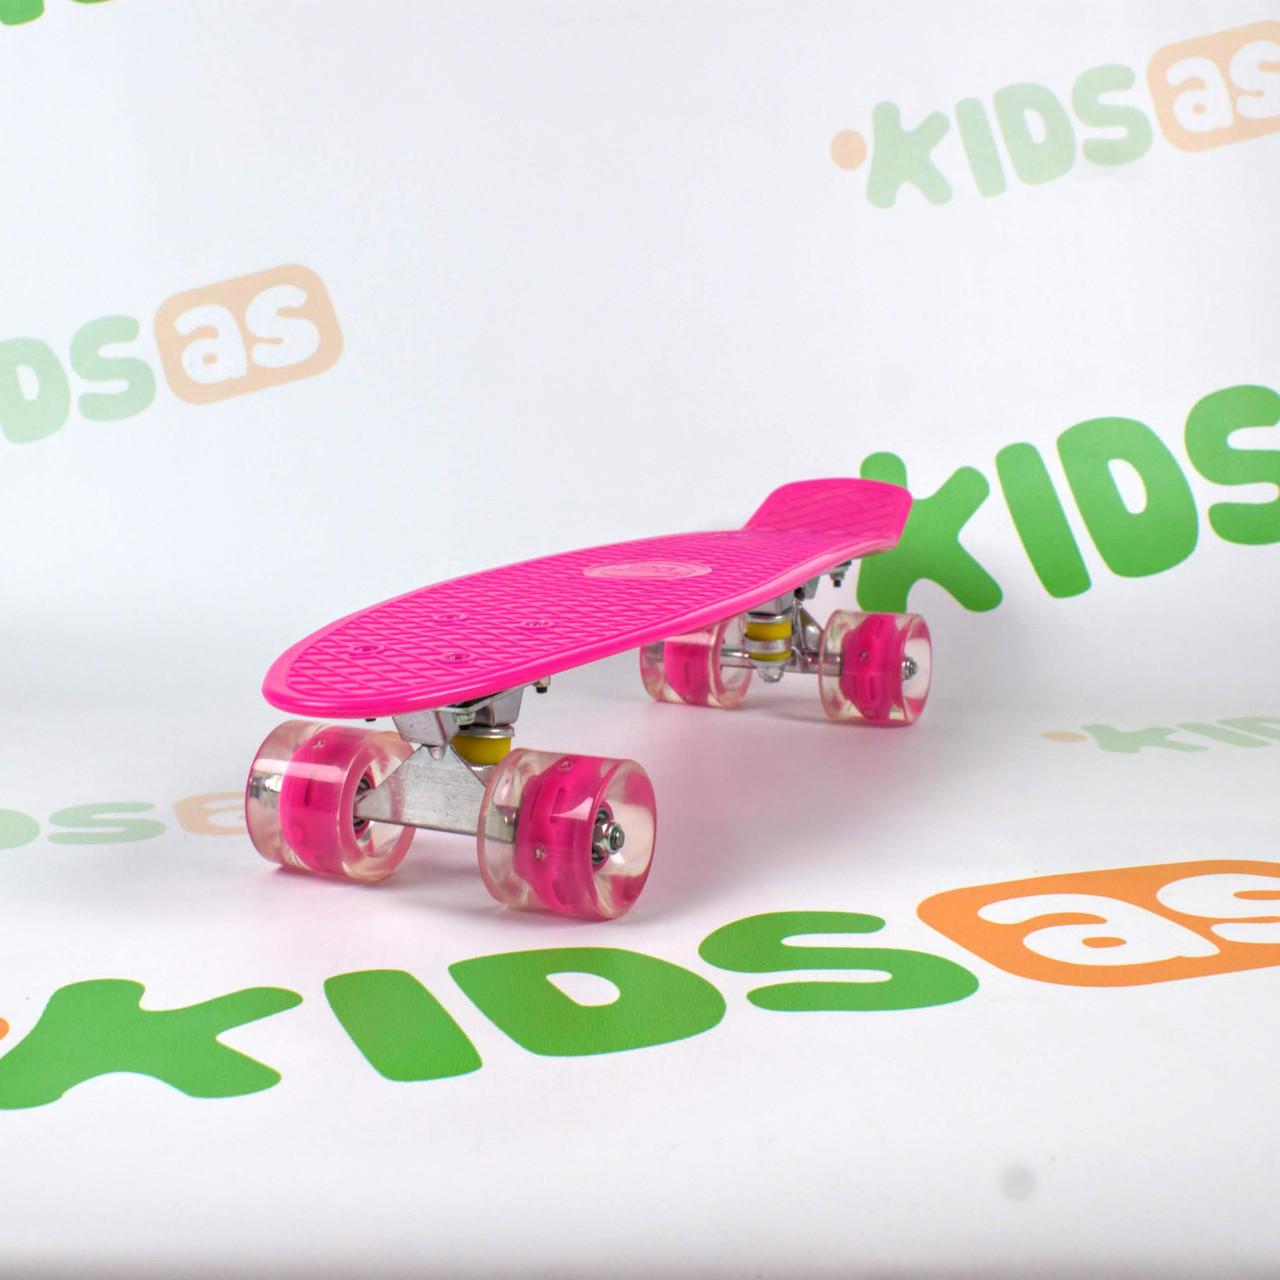 Скейт MS 0848-5 Rose Penny Board свет колес